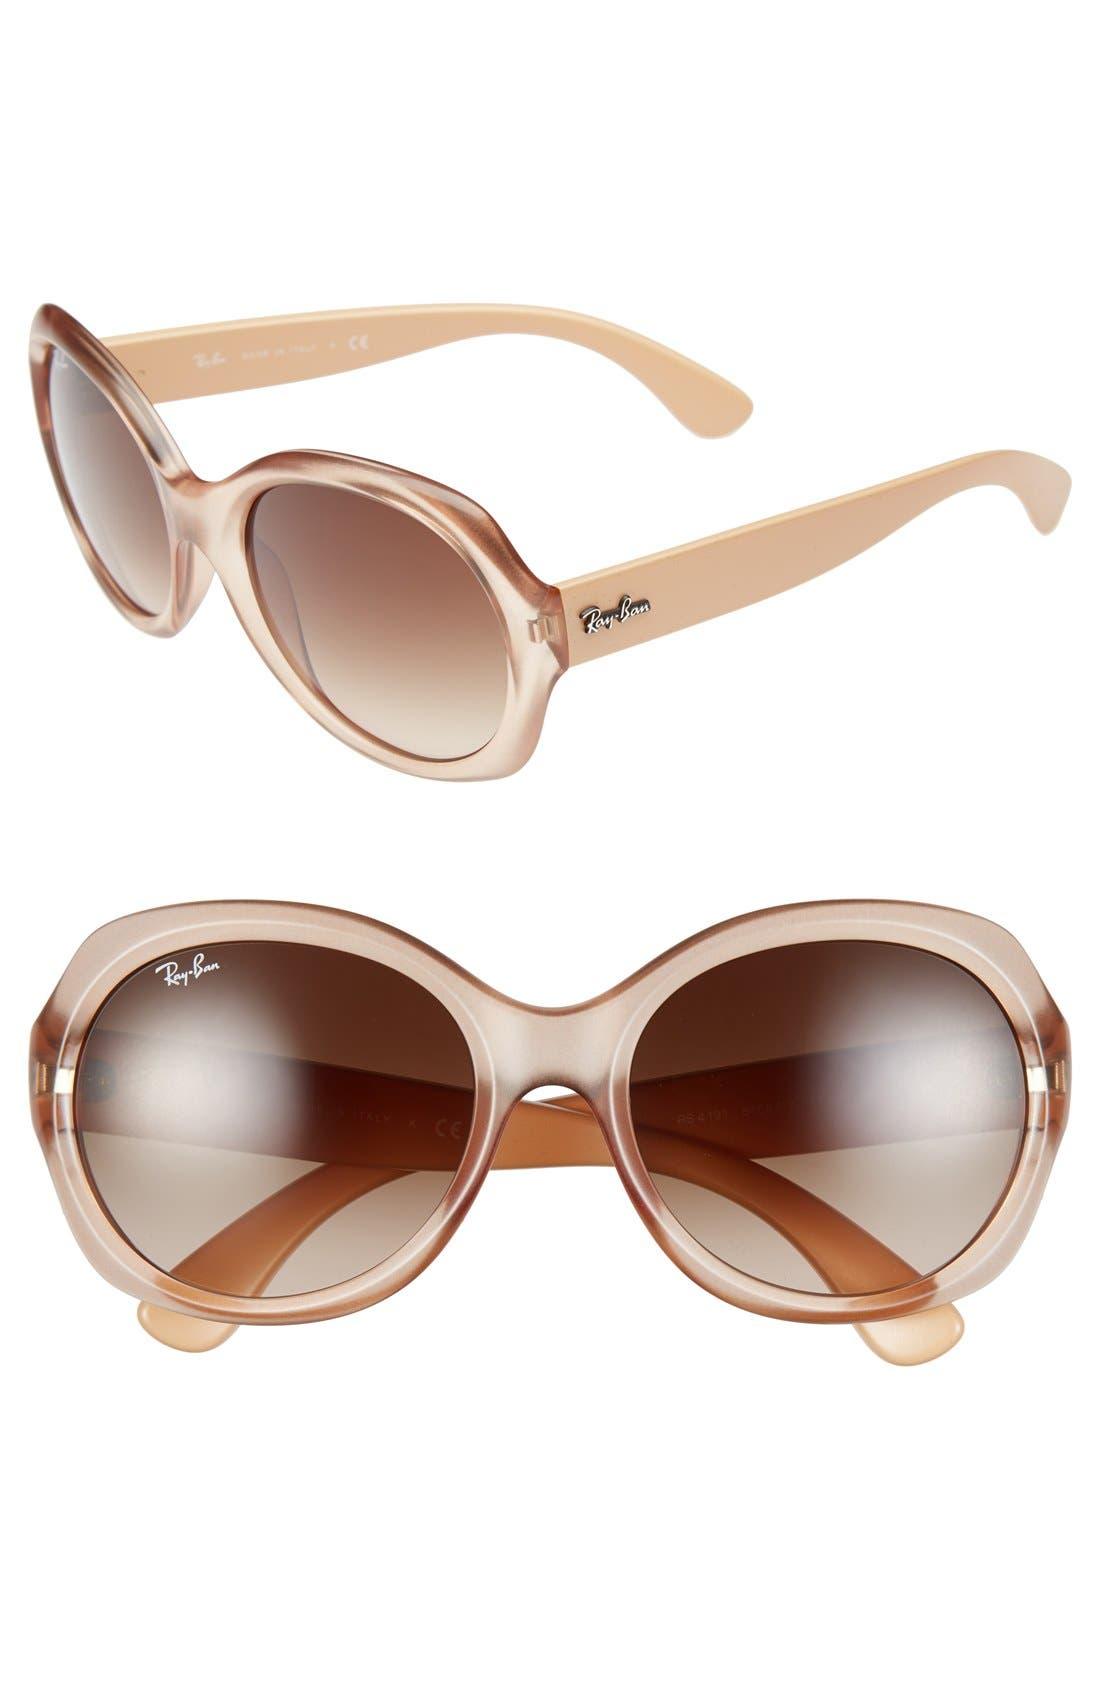 Main Image - Ray-Ban 57mm Round Gradient Sunglasses